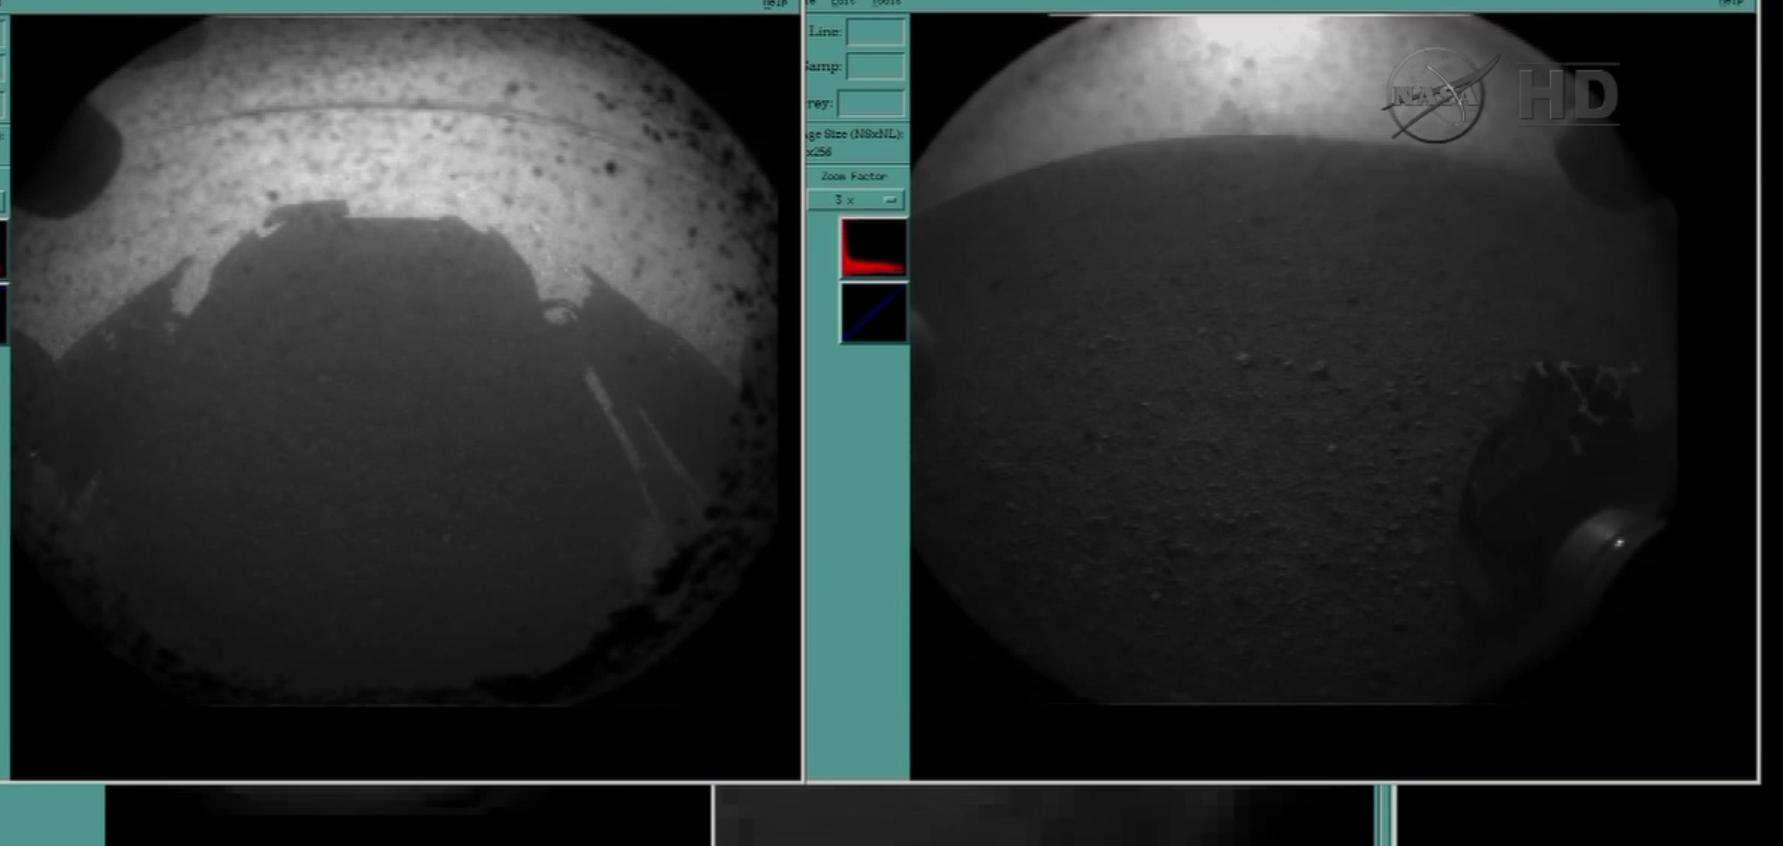 mars curiosity rover live feed - photo #18